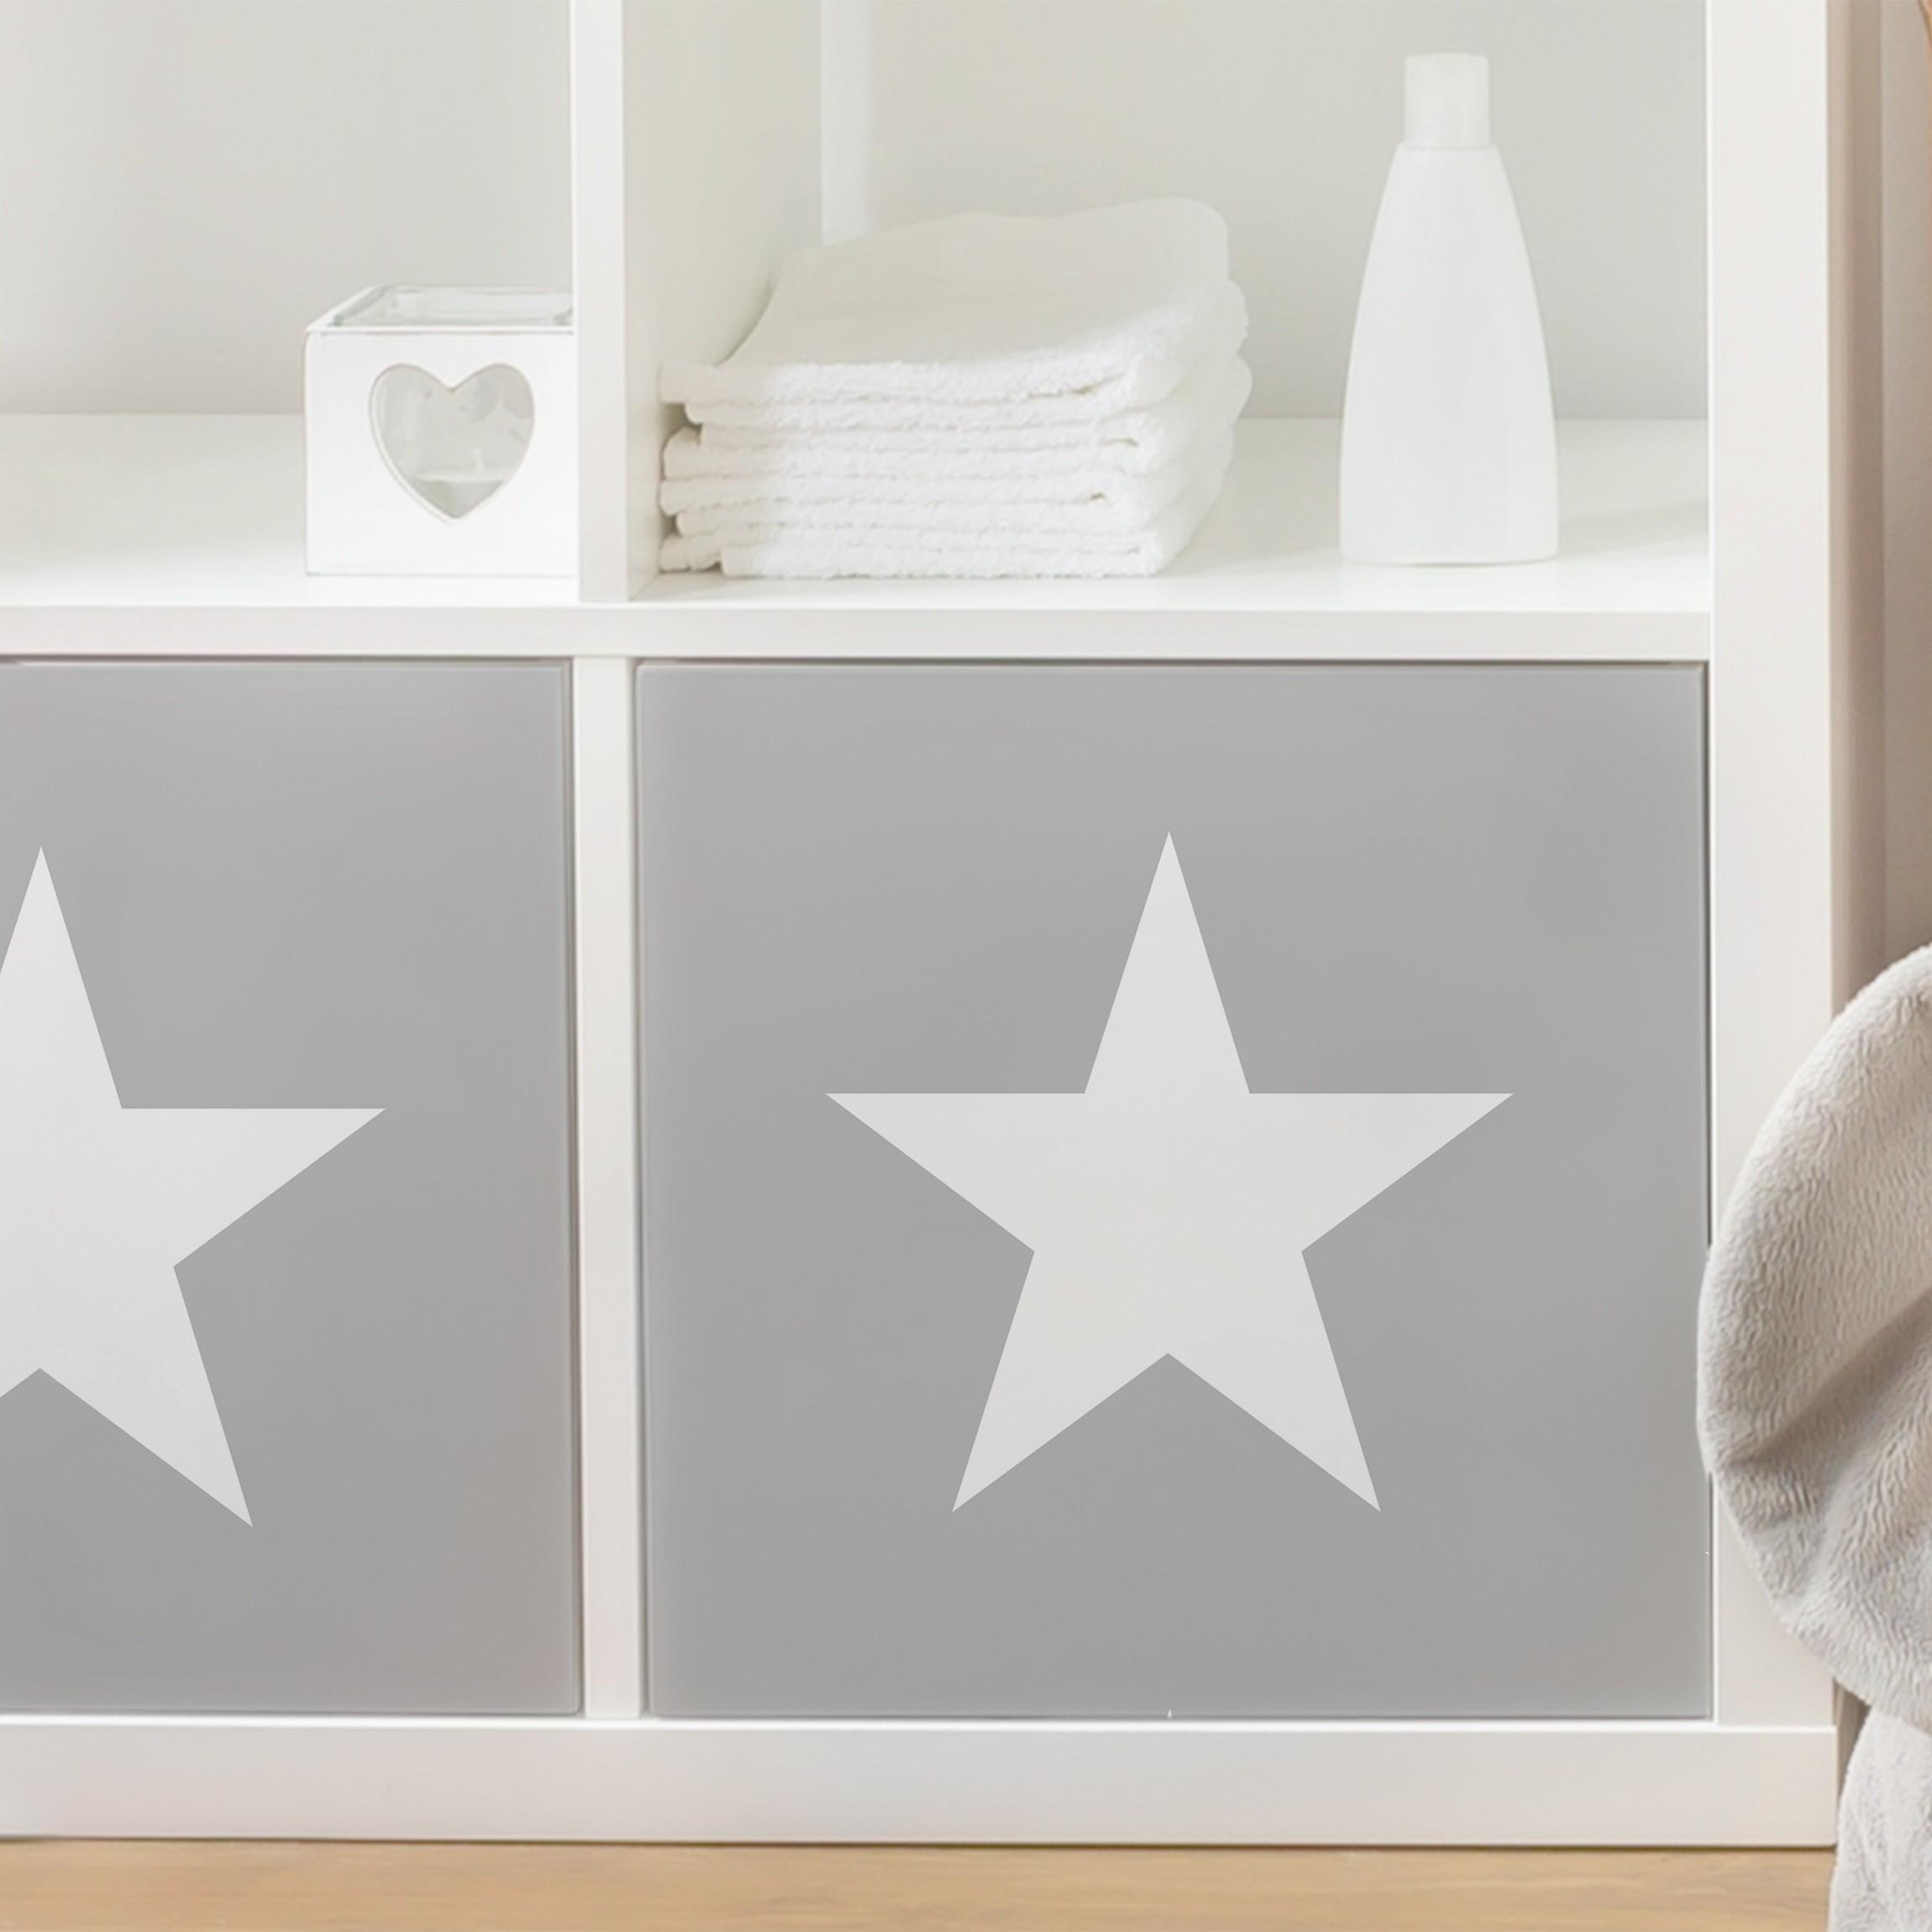 Mobelfolie Weisse Sterne Auf Grau Folie Fur Mobel Selbstklebend